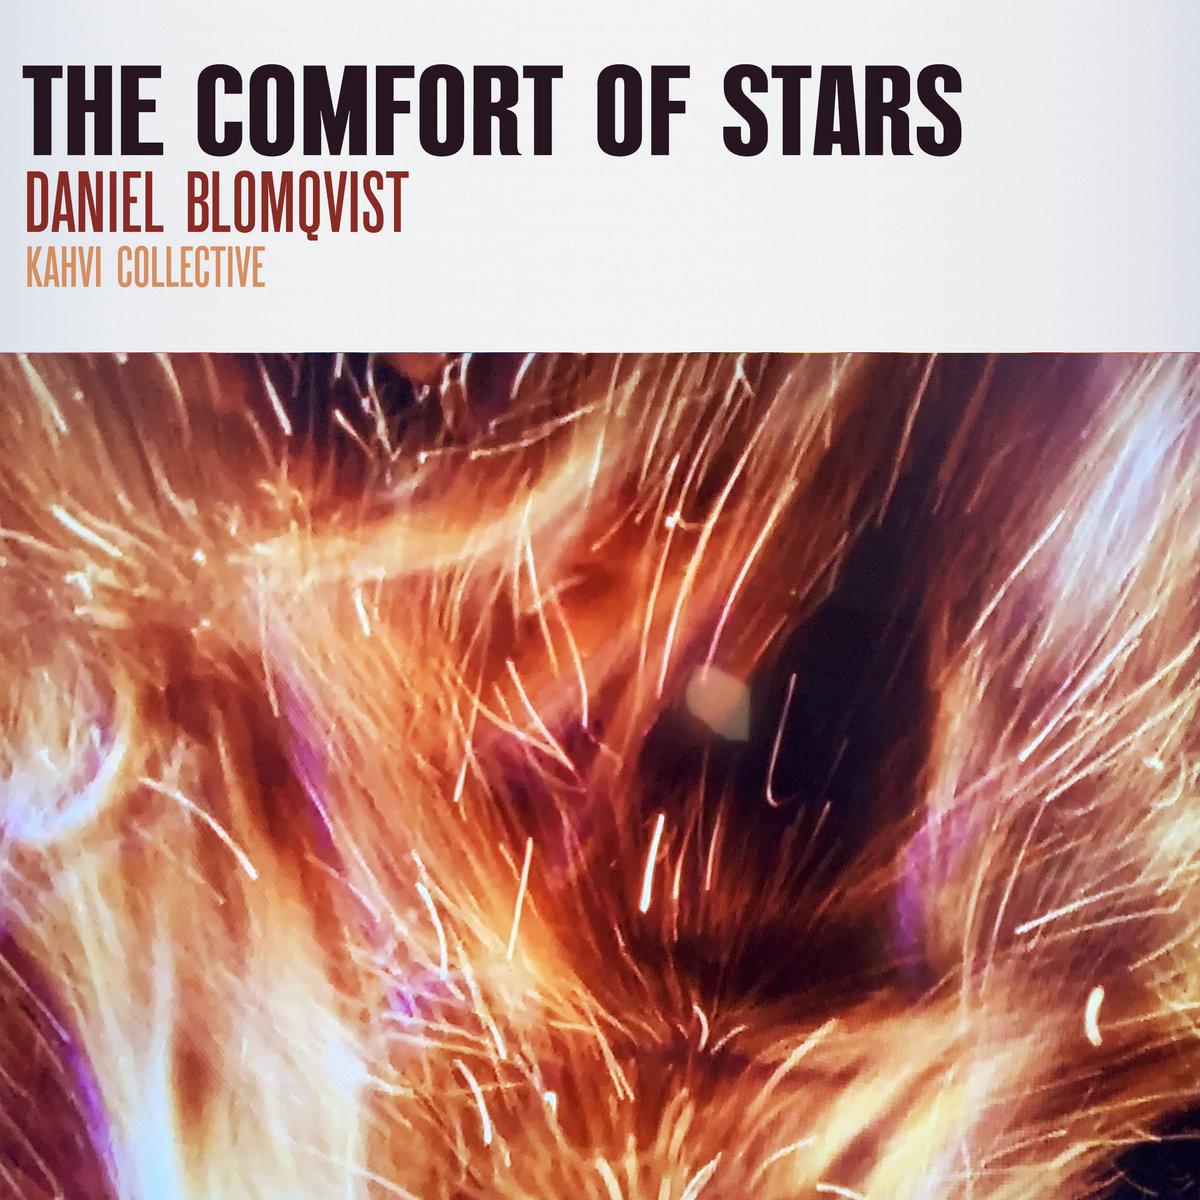 Daniel Blomqvist – The Comfort of Stars